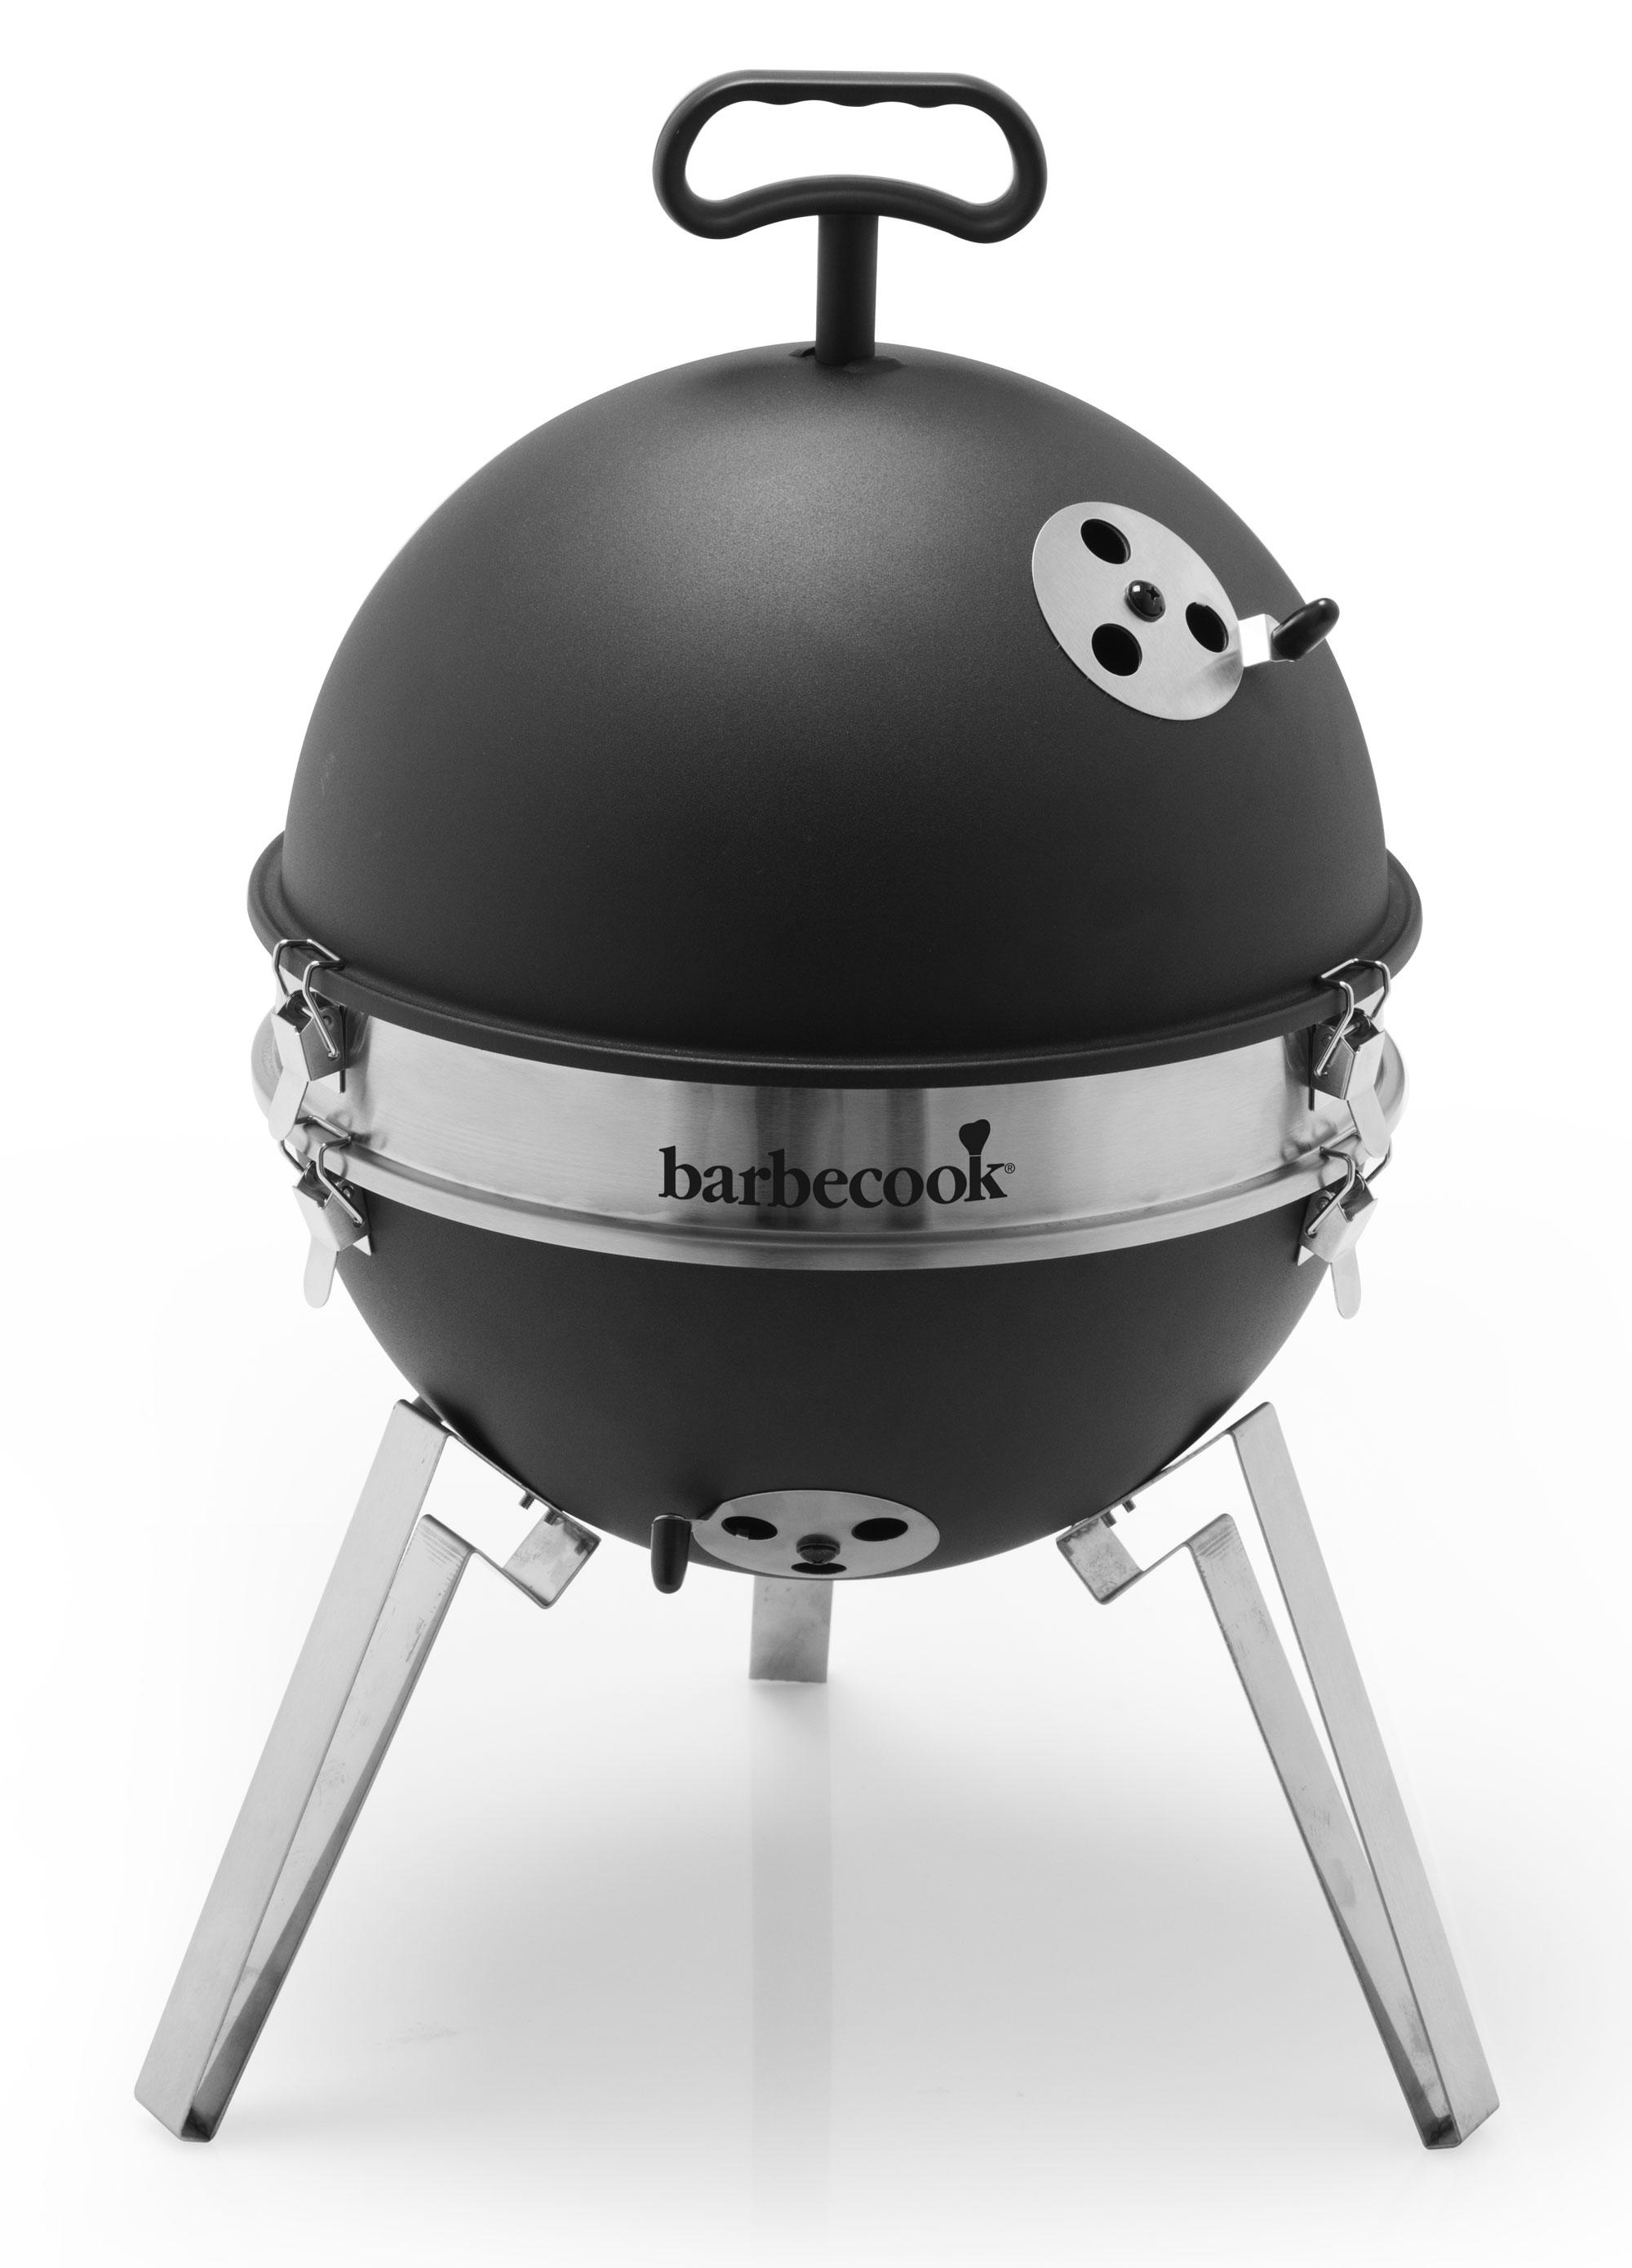 Campinggrill / Holzkohlegrill barbecook Billy Grillfläche Ø29,7cm Bild 1